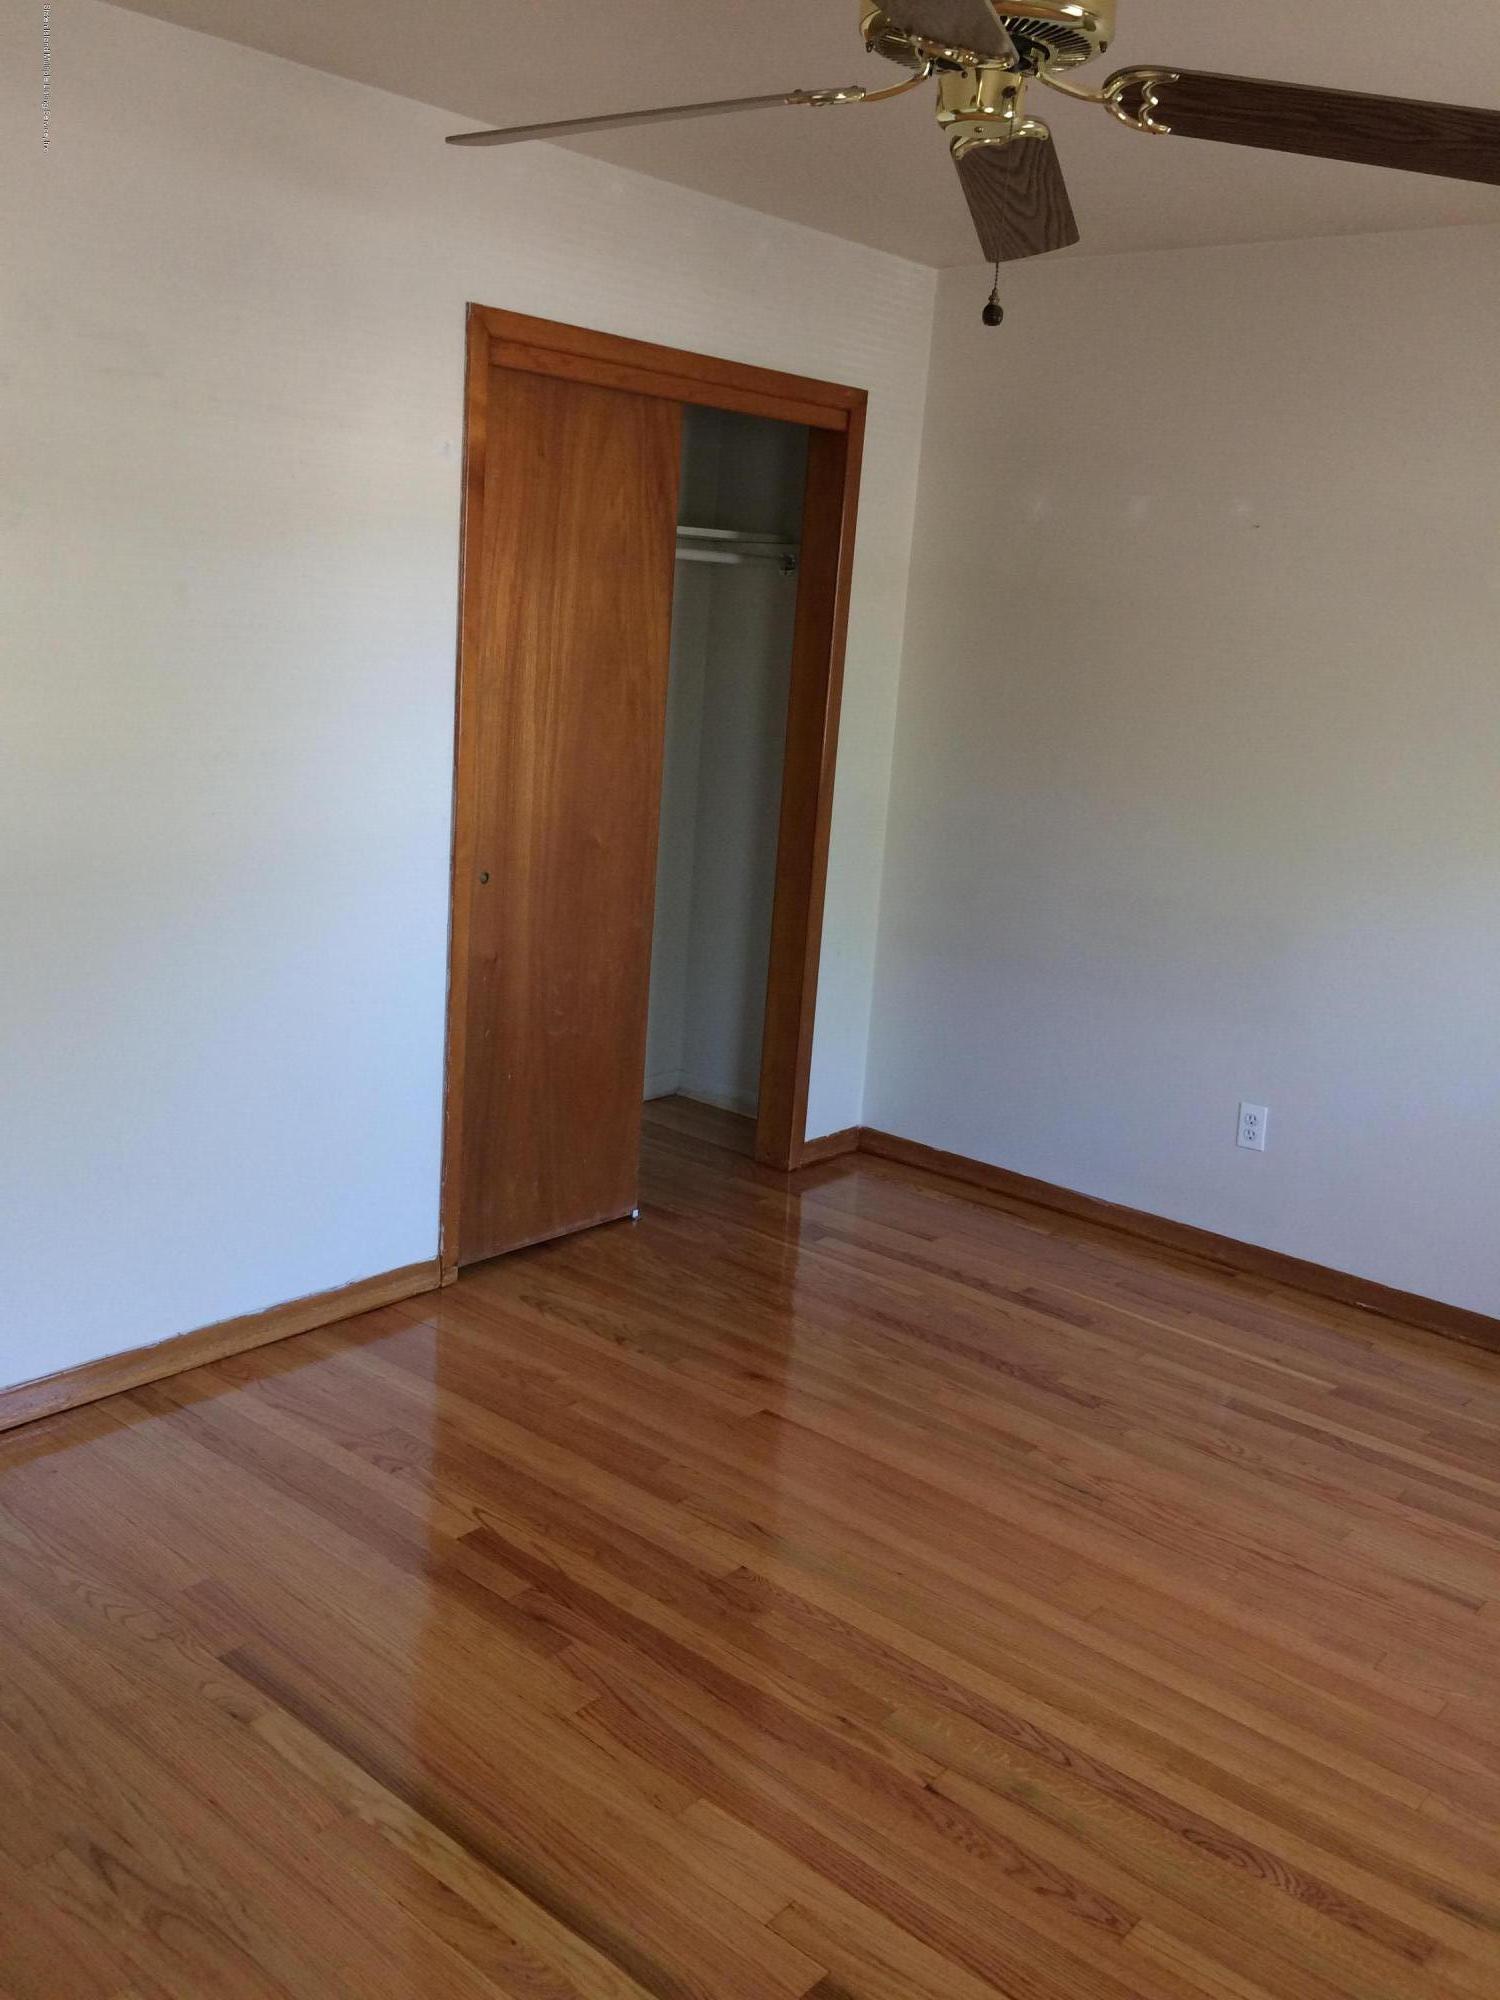 Single Family - Semi-Attached 30 Bent Street  Staten Island, NY 10312, MLS-1130498-8